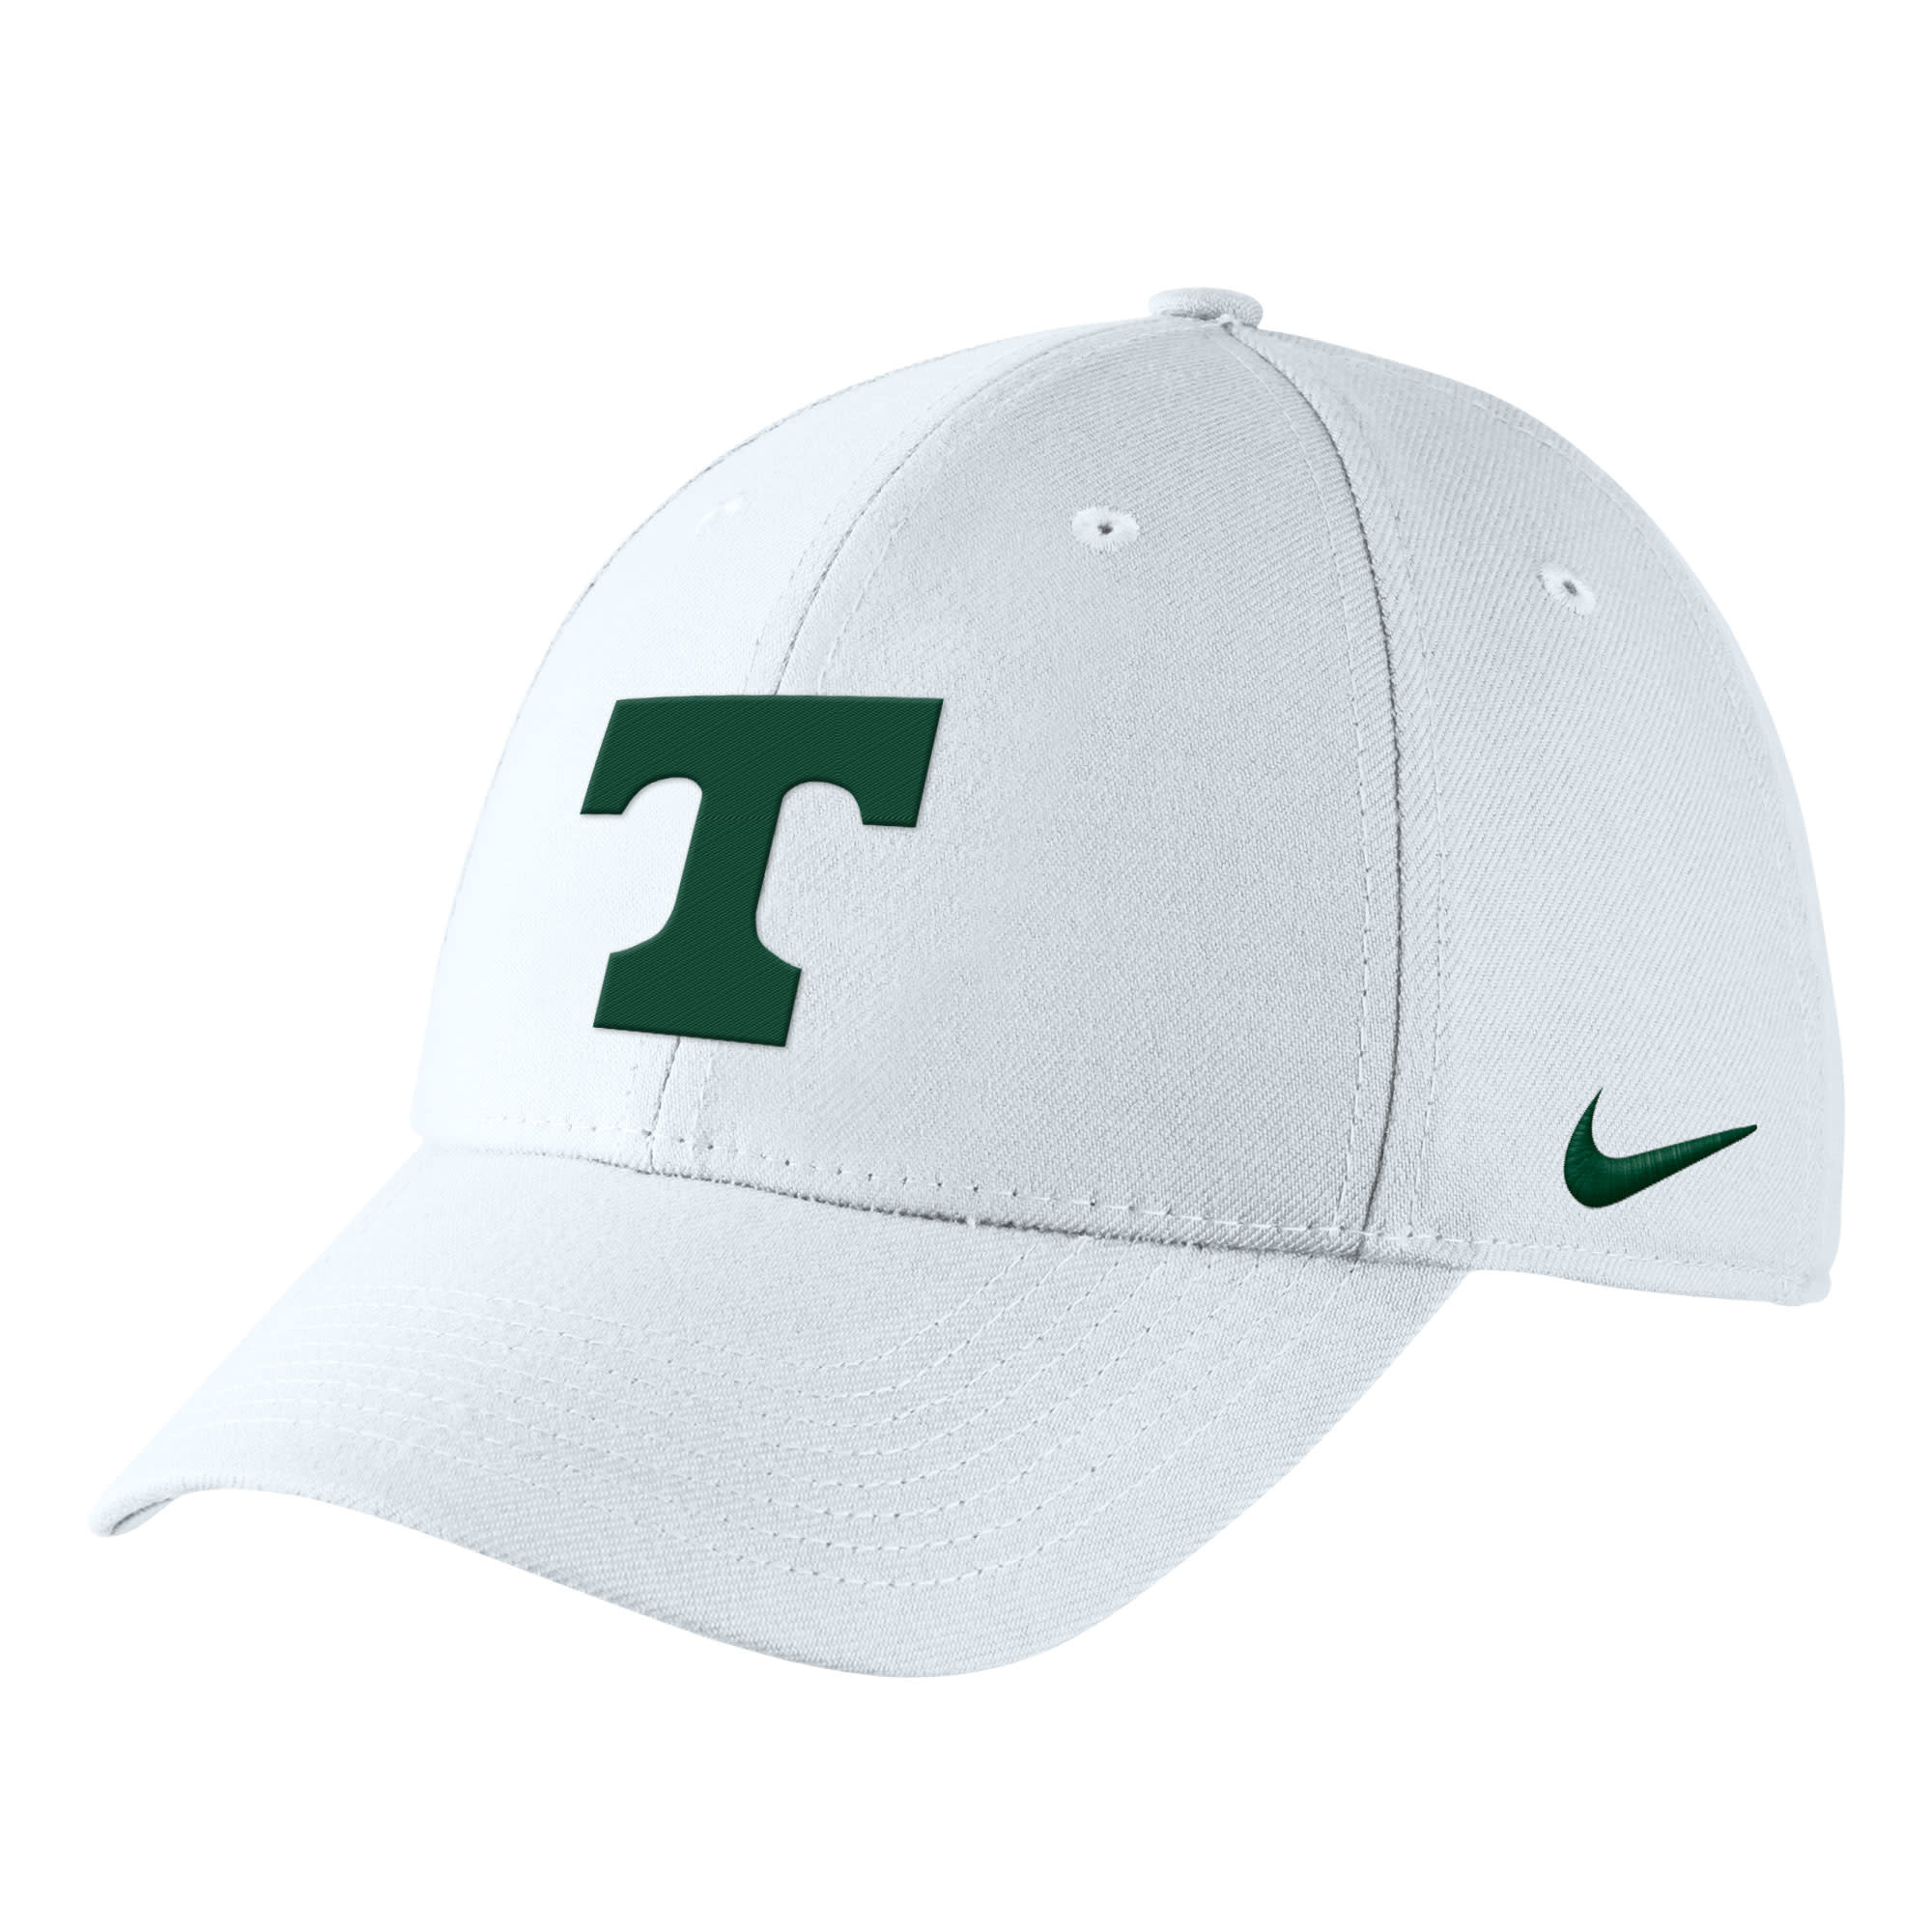 Nike Nike Flex White Hat